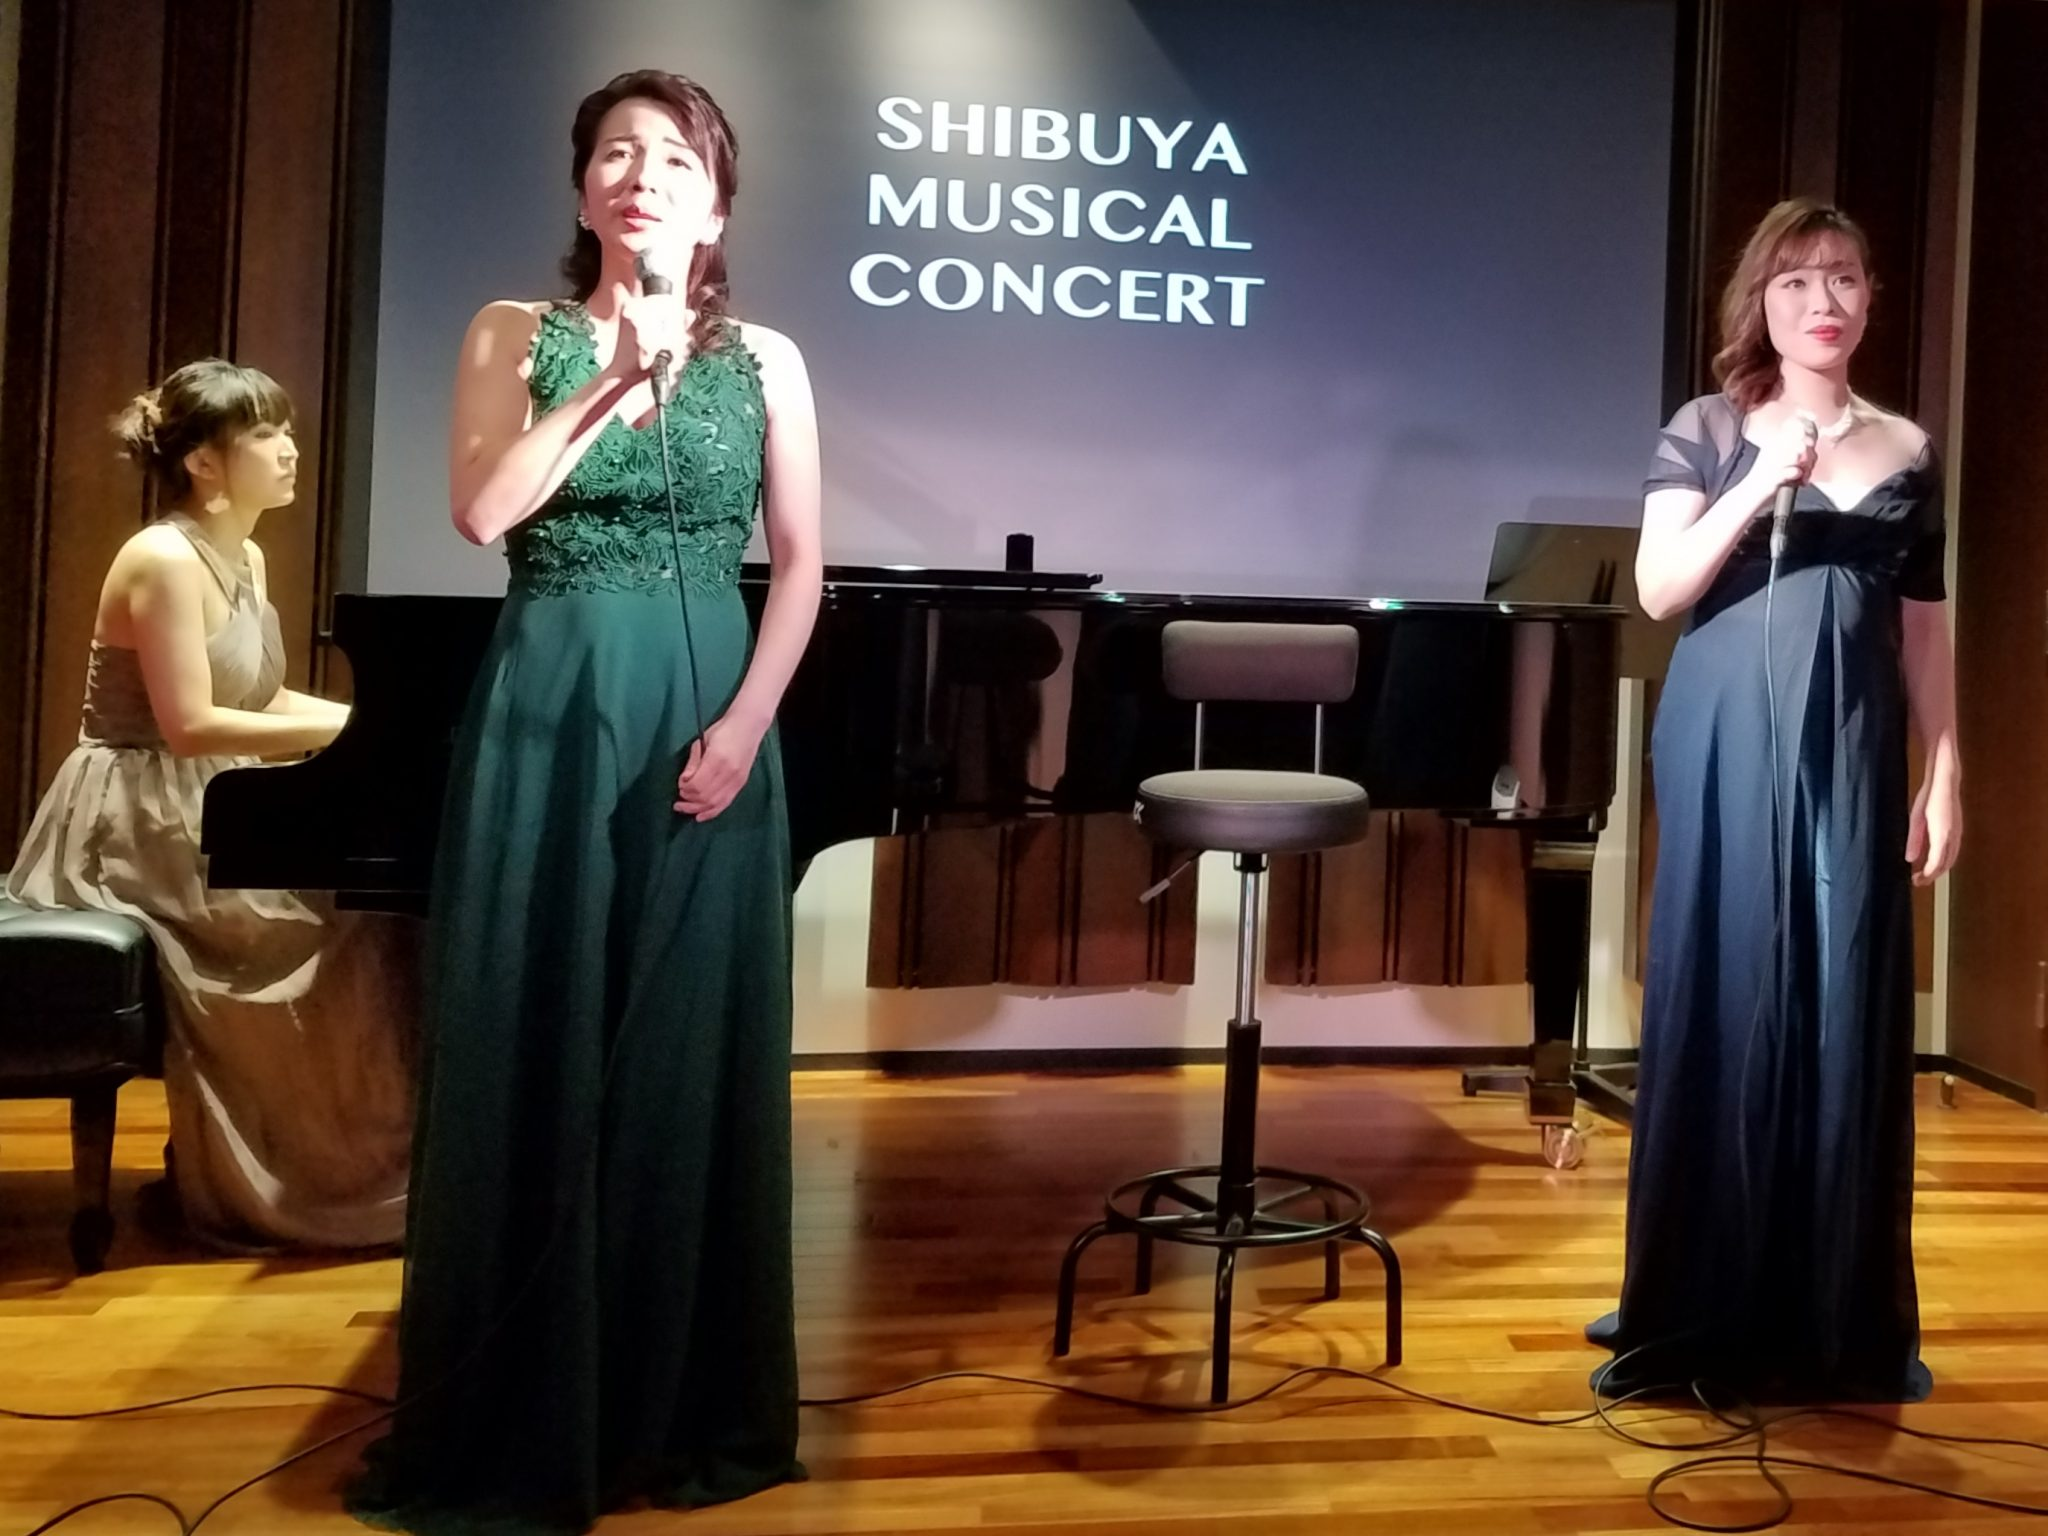 Shibuya Musical Concert featuring Ayako Hara and Minami Asai of Manon